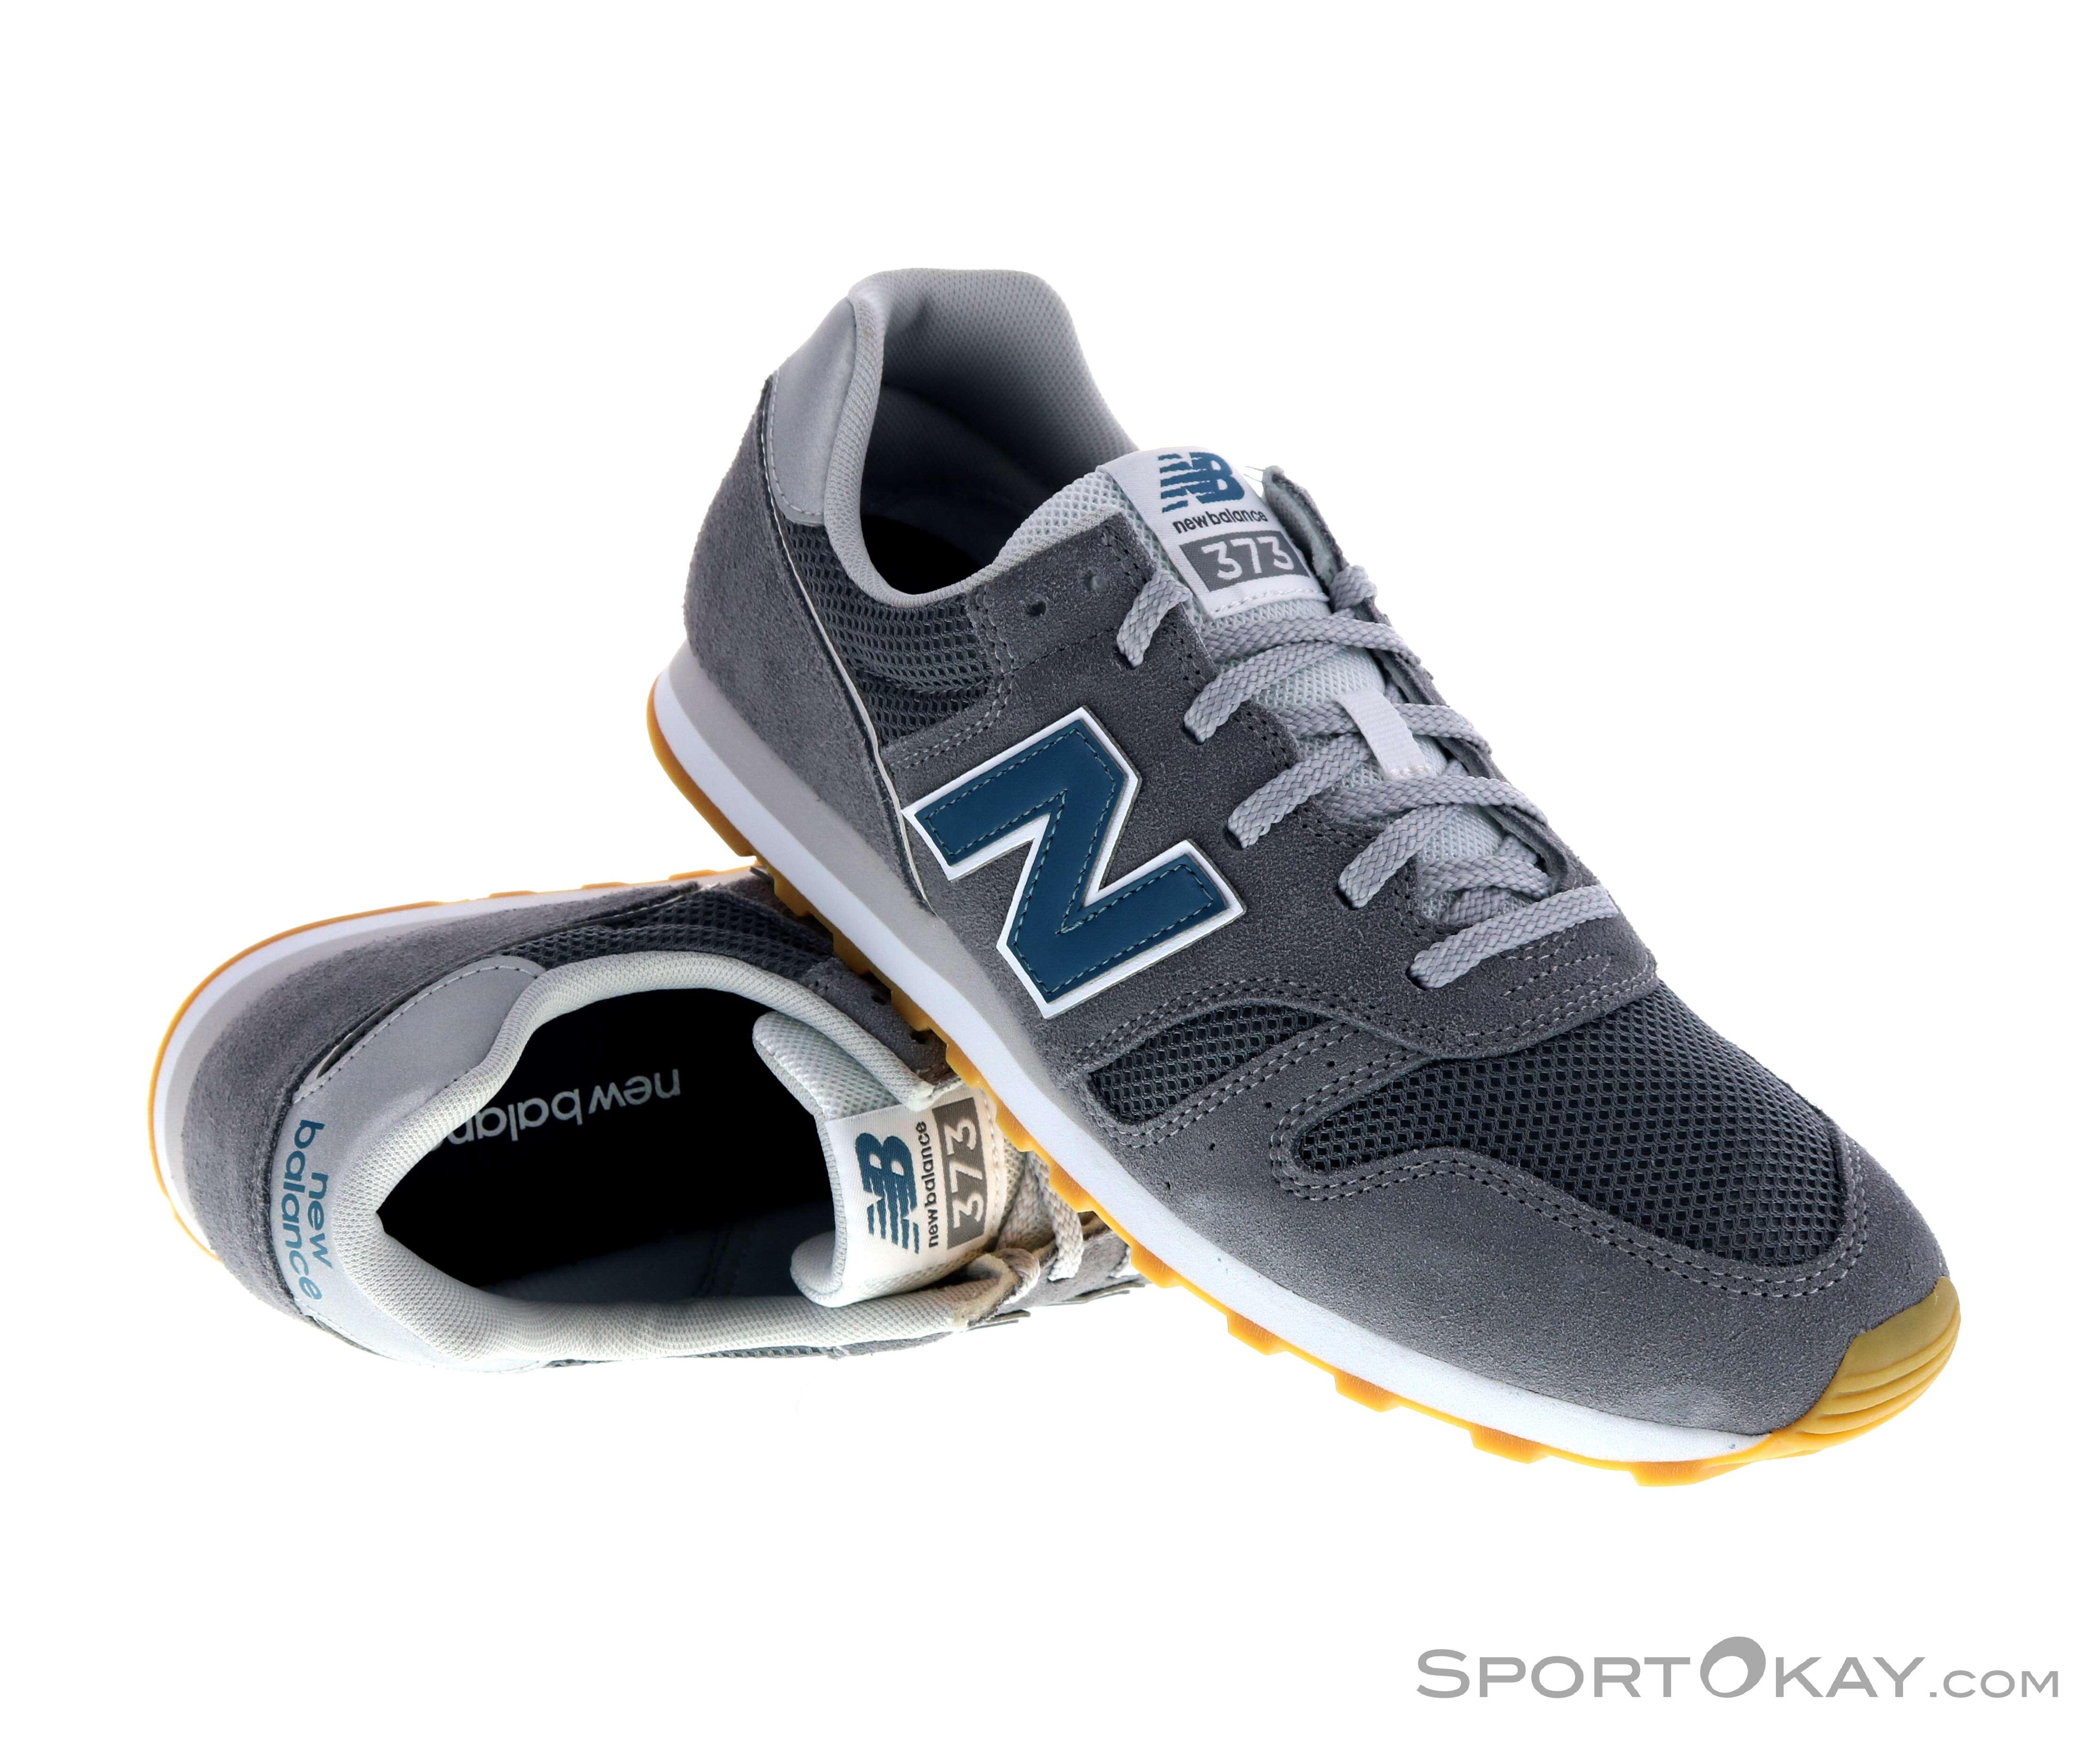 New Balance 373 Mens Leisure Shoes - Leisure Shoes - Shoes & Poles ...